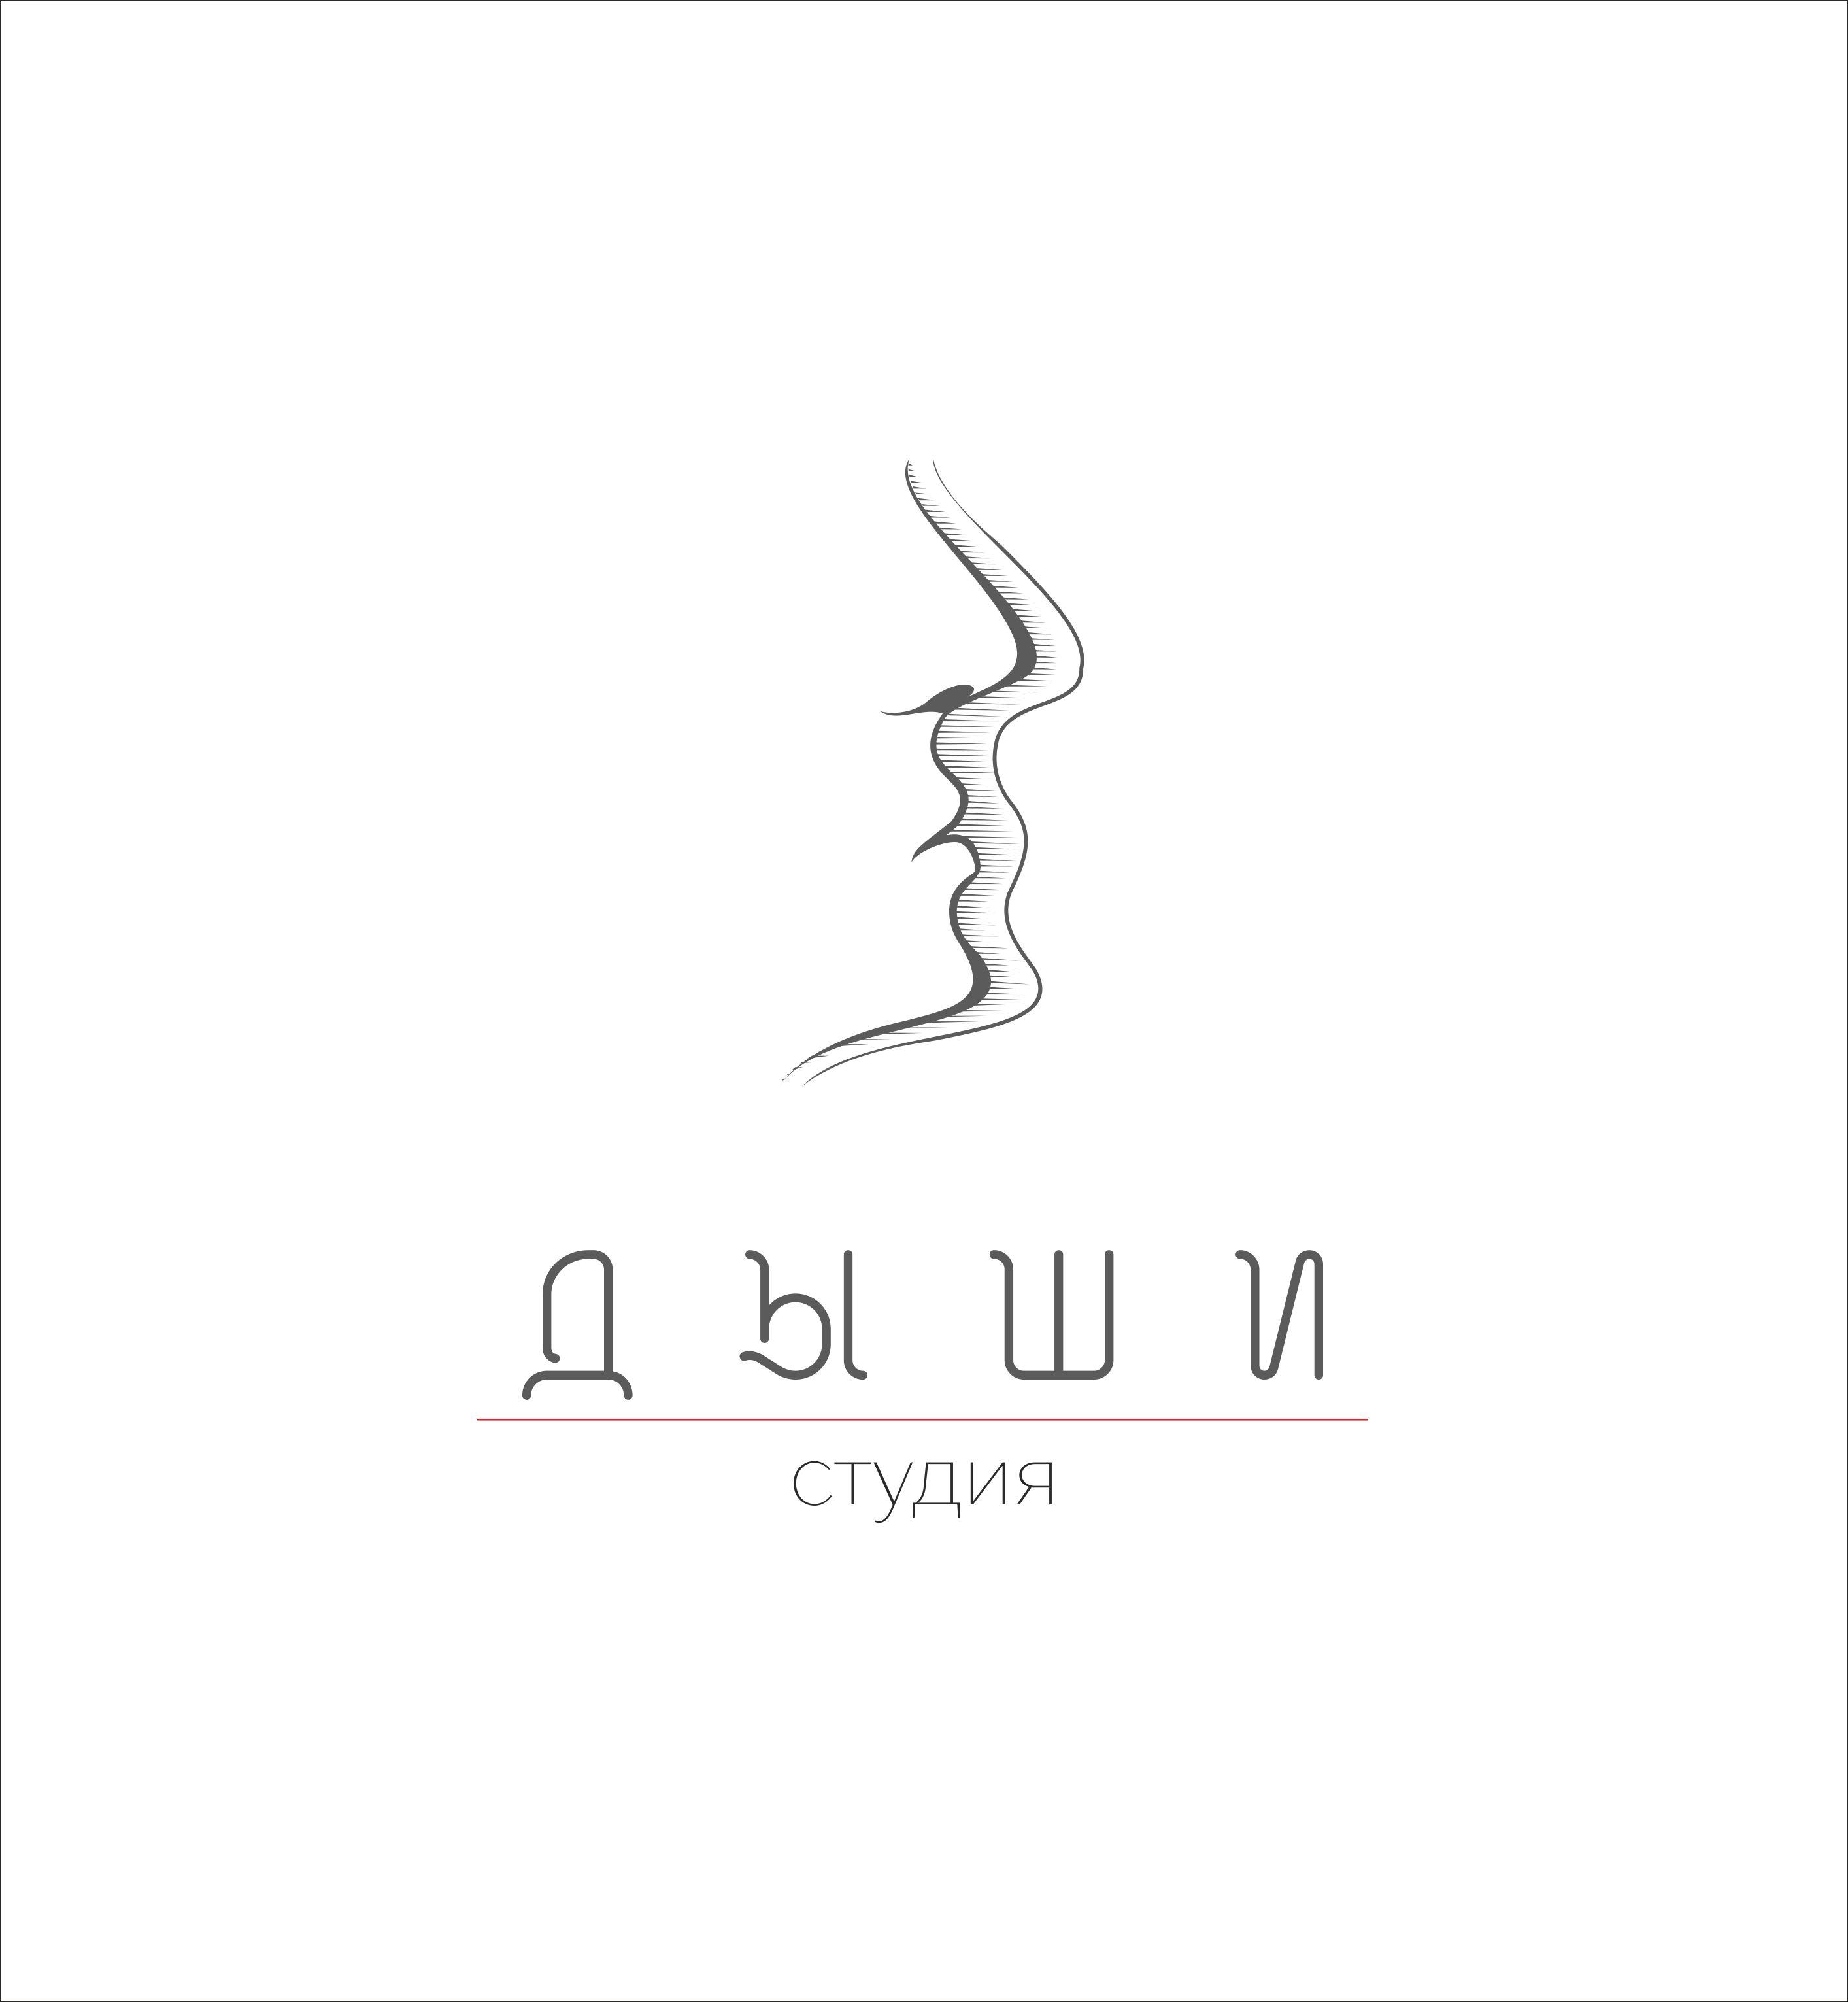 "Логотип для студии ""Дыши""  и фирменный стиль фото f_44656f4f4d97b001.jpg"